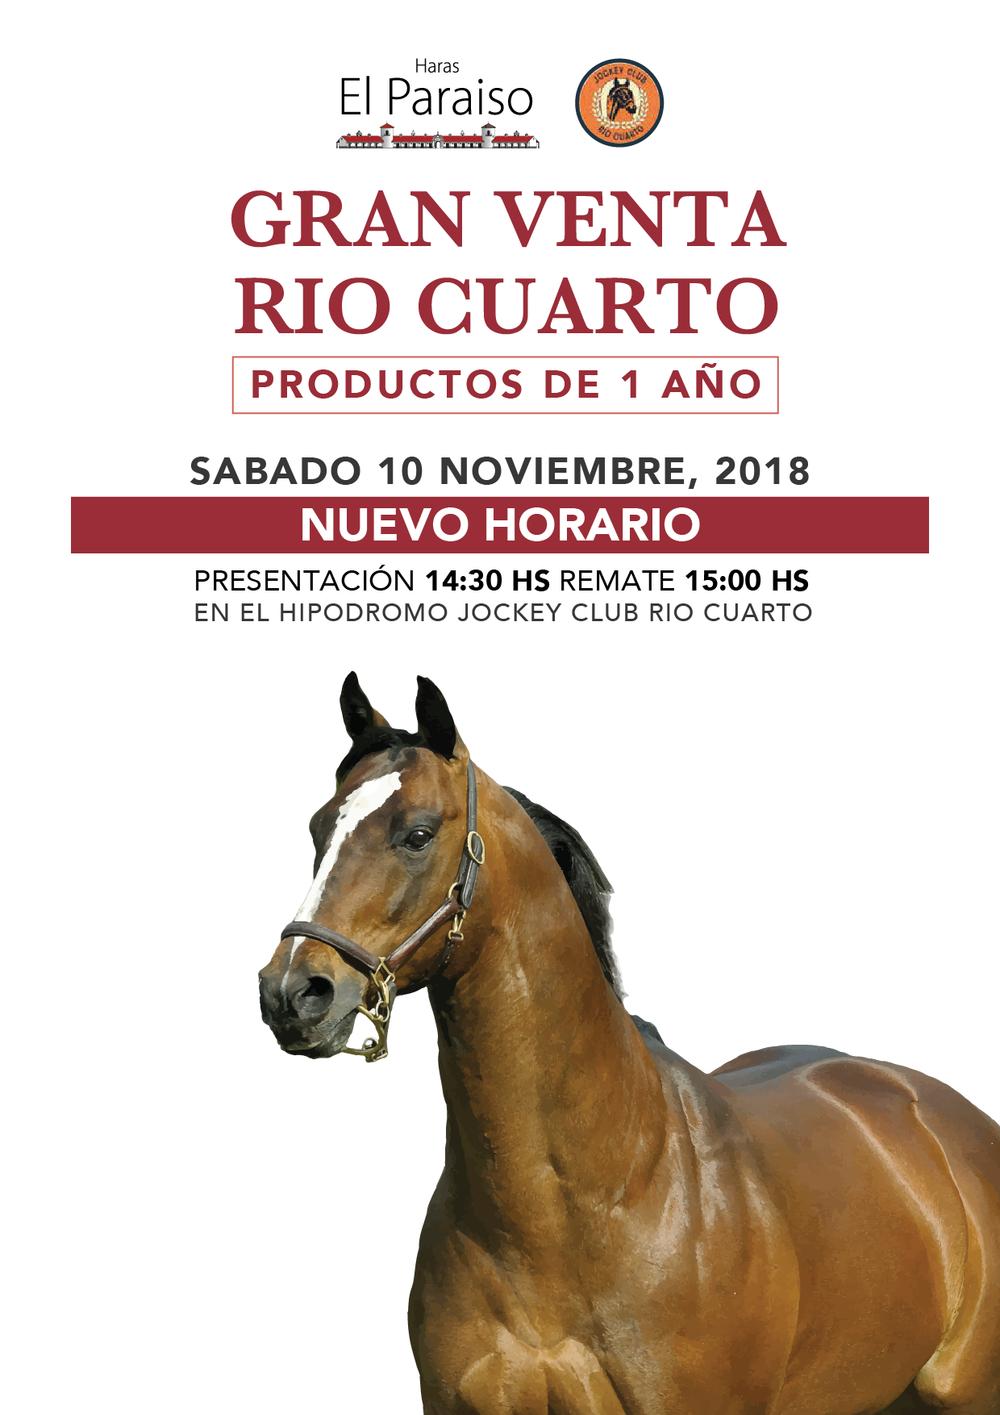 Rio Cuarto Tapa-02.png